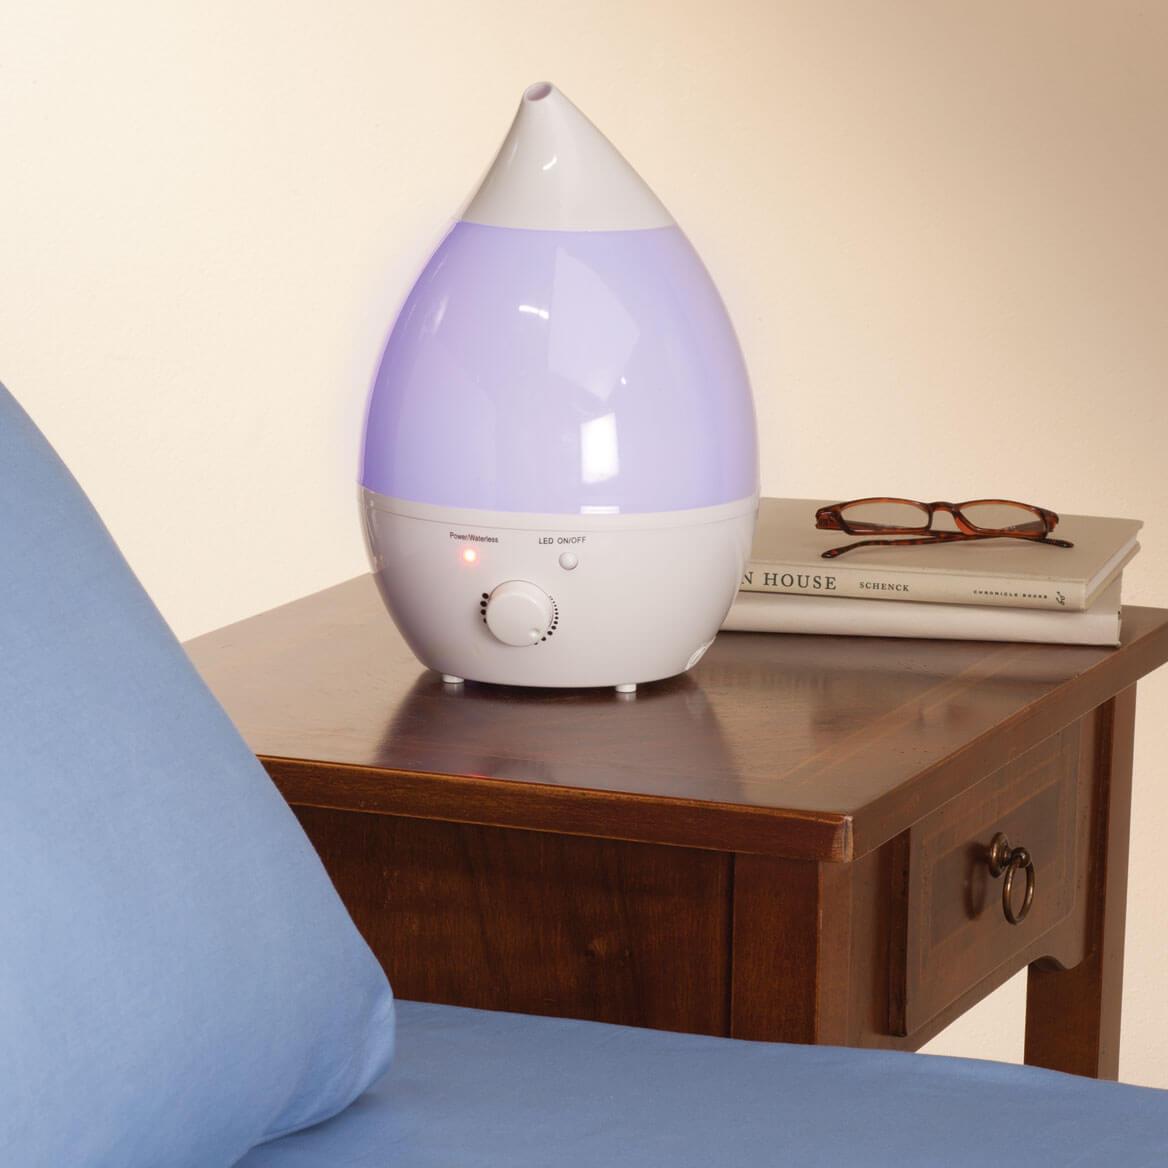 Ultrasonic Room Humidifier-357557